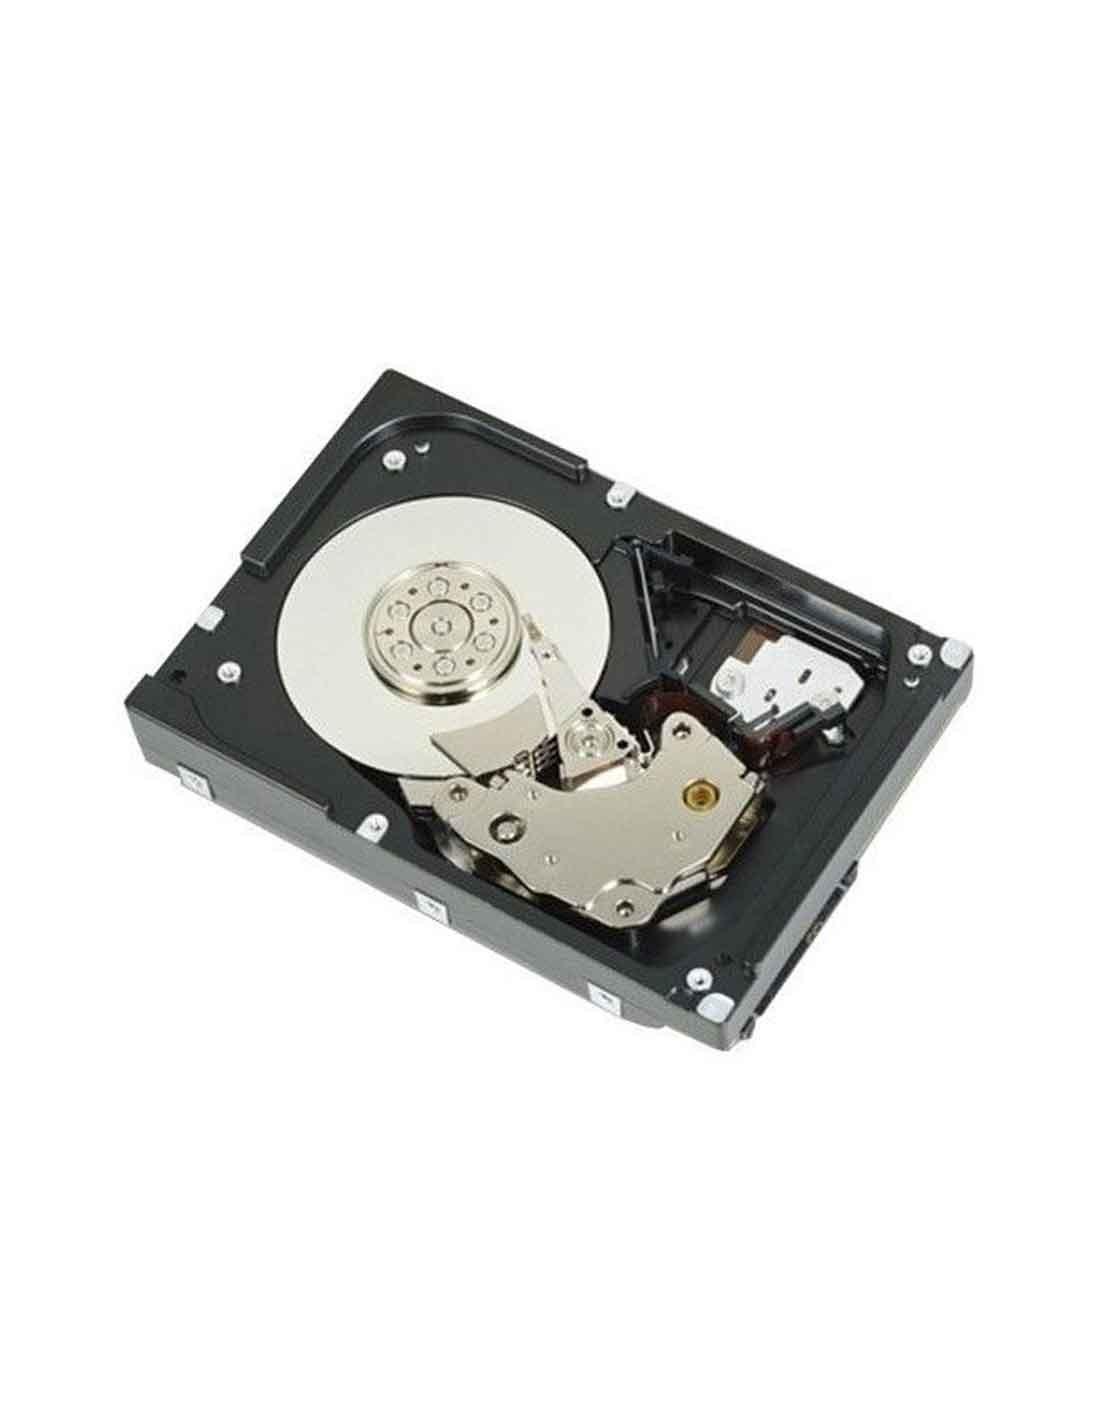 Dell 1.2TB 10K RPM SAS 12Gbps 2.5in Hot-plug Drive at a cheap price in Dubai UAE